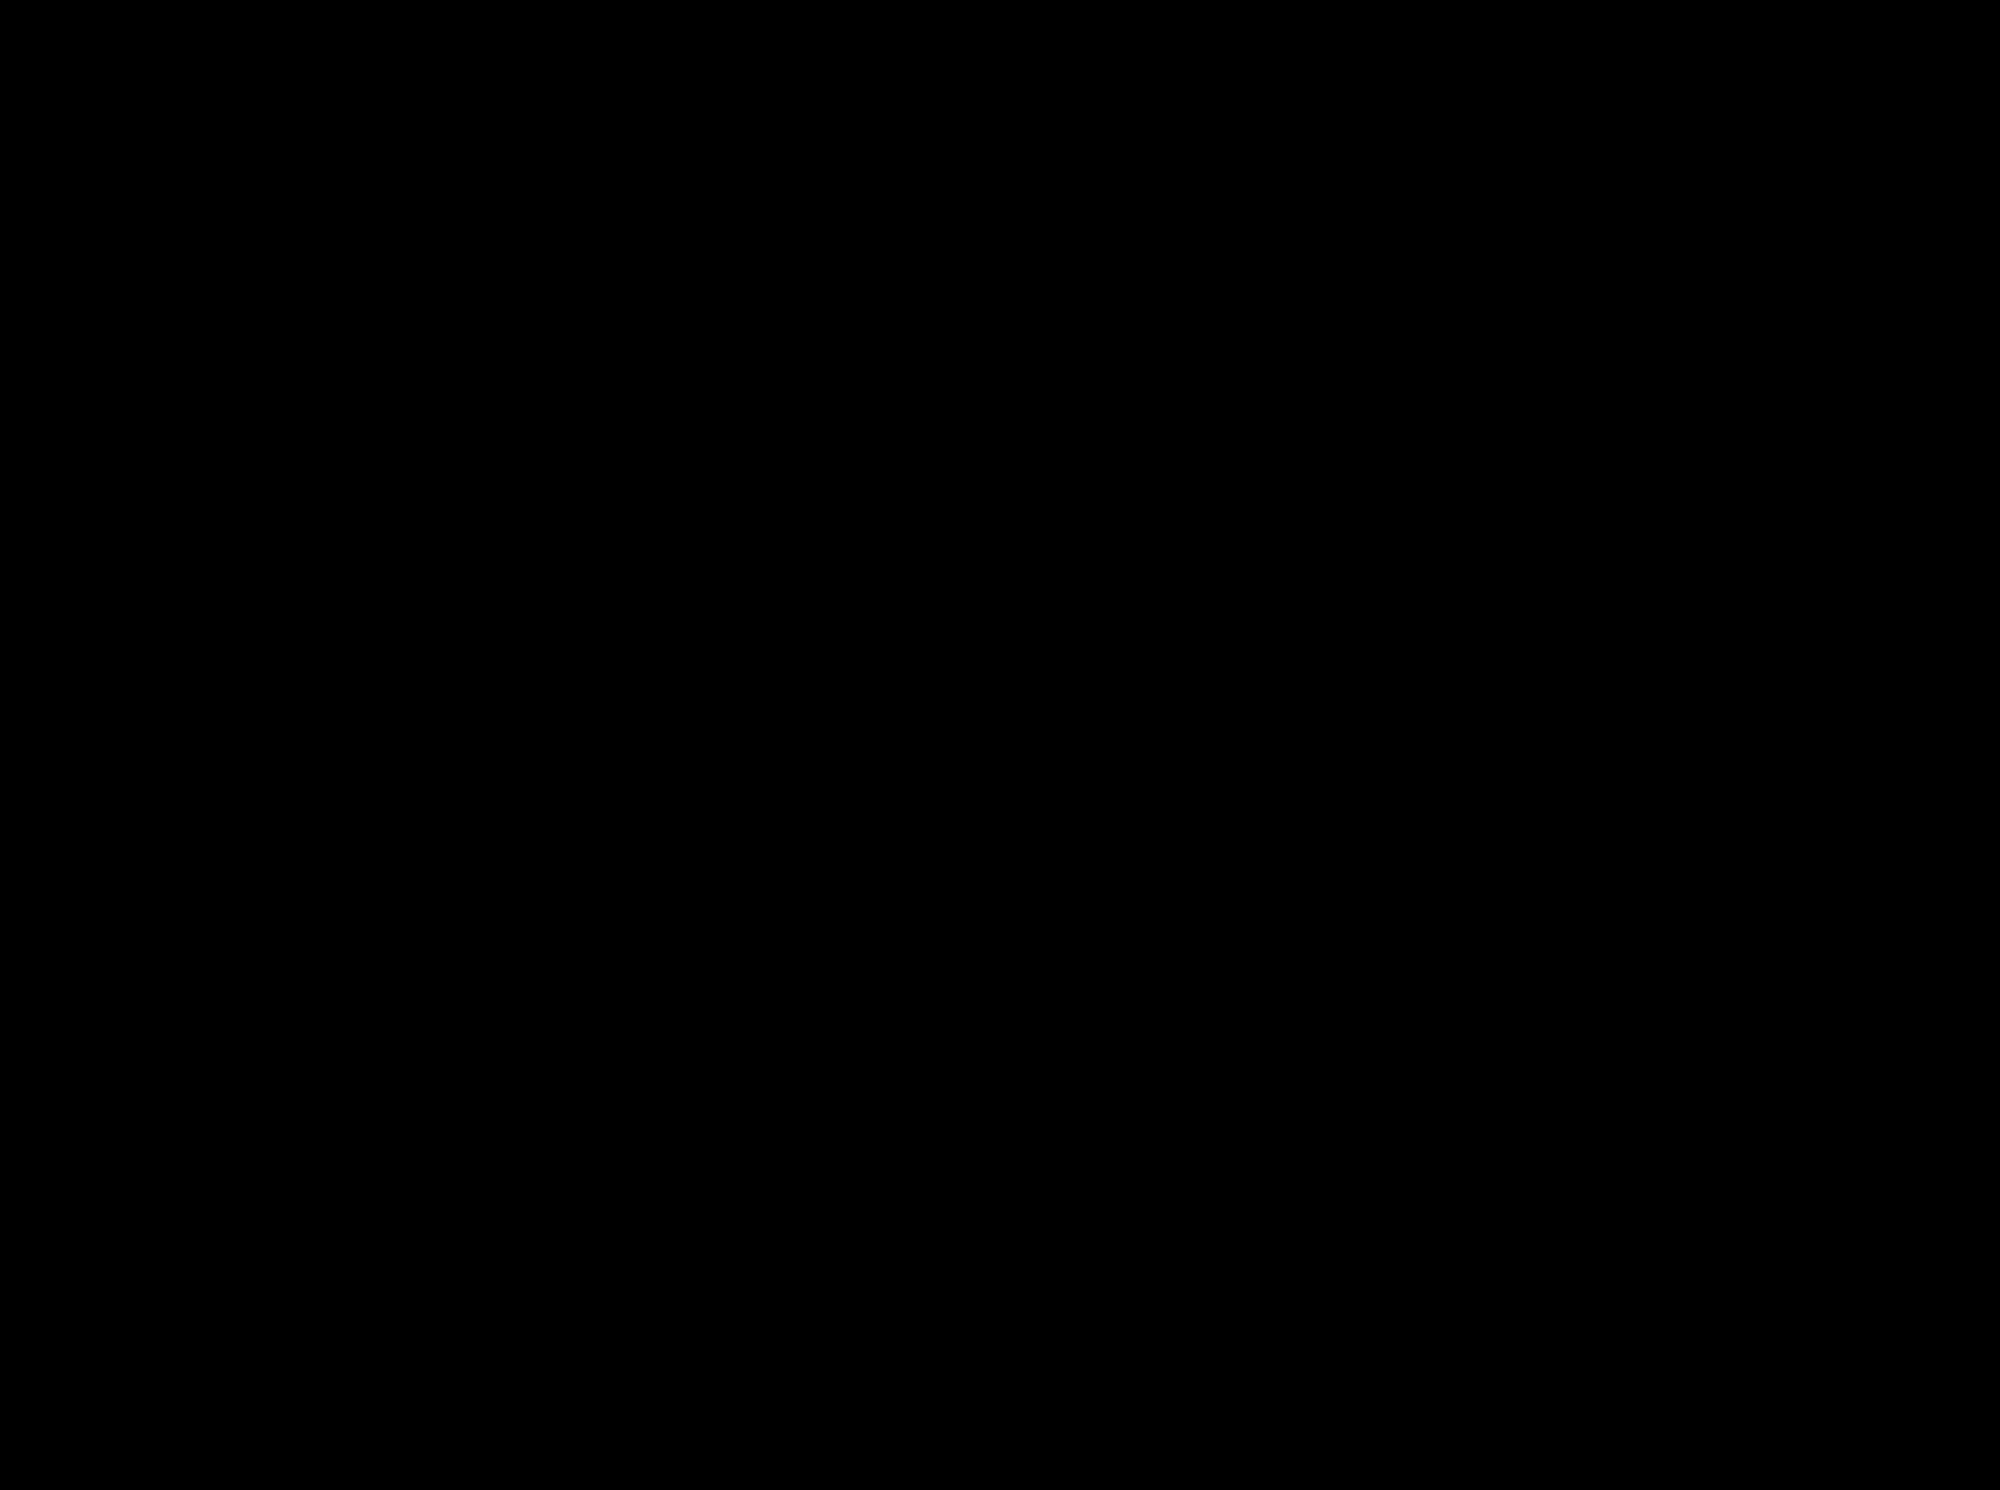 logo-black(13).png